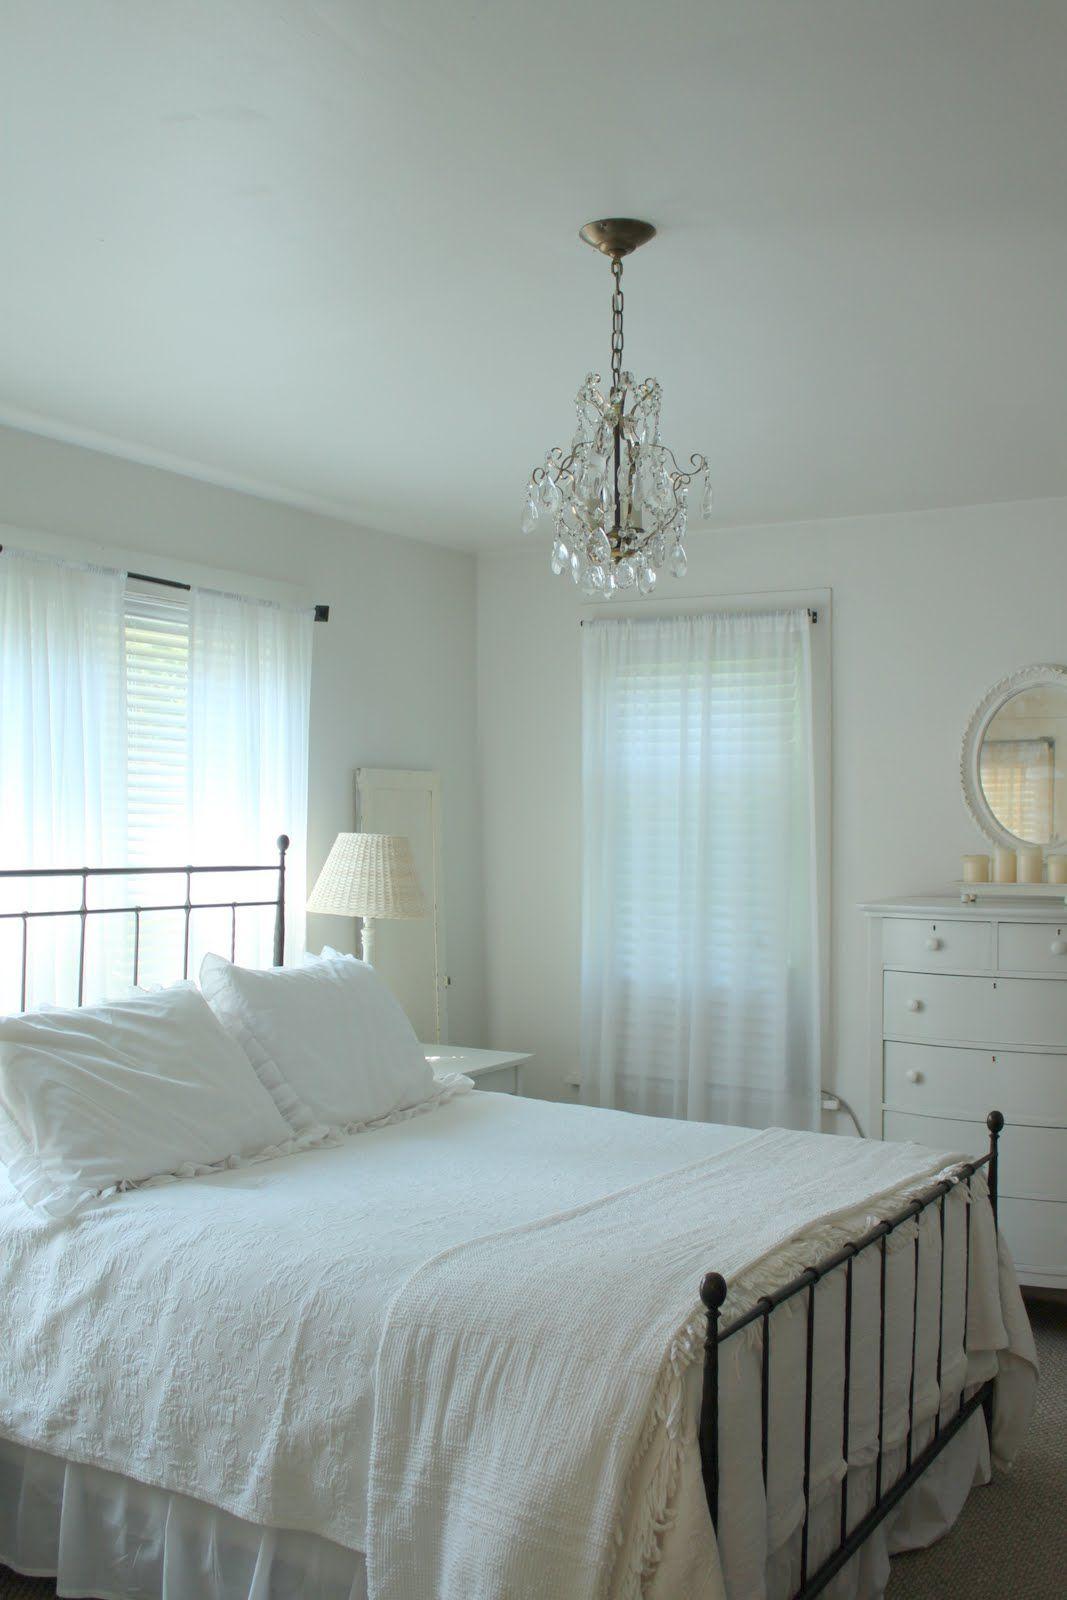 Witte slaapkamer #wit #slaapkamer #inspiratie #bedroom #white #inspiration